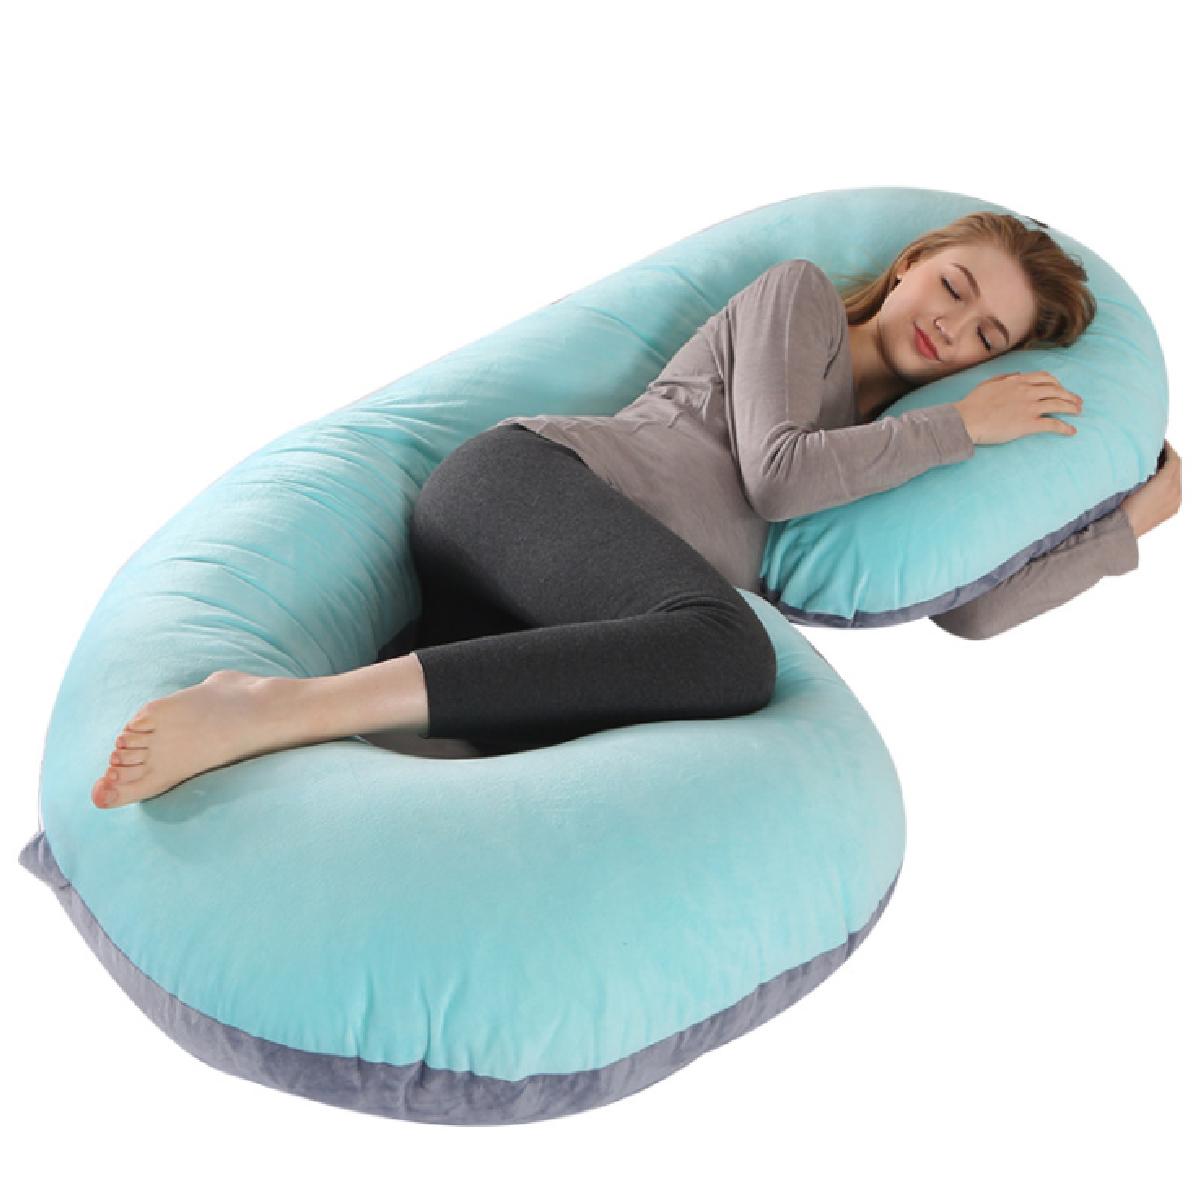 full body pregnancy pillow c shaped bedding body pillow maternity pillow for pregnant blue